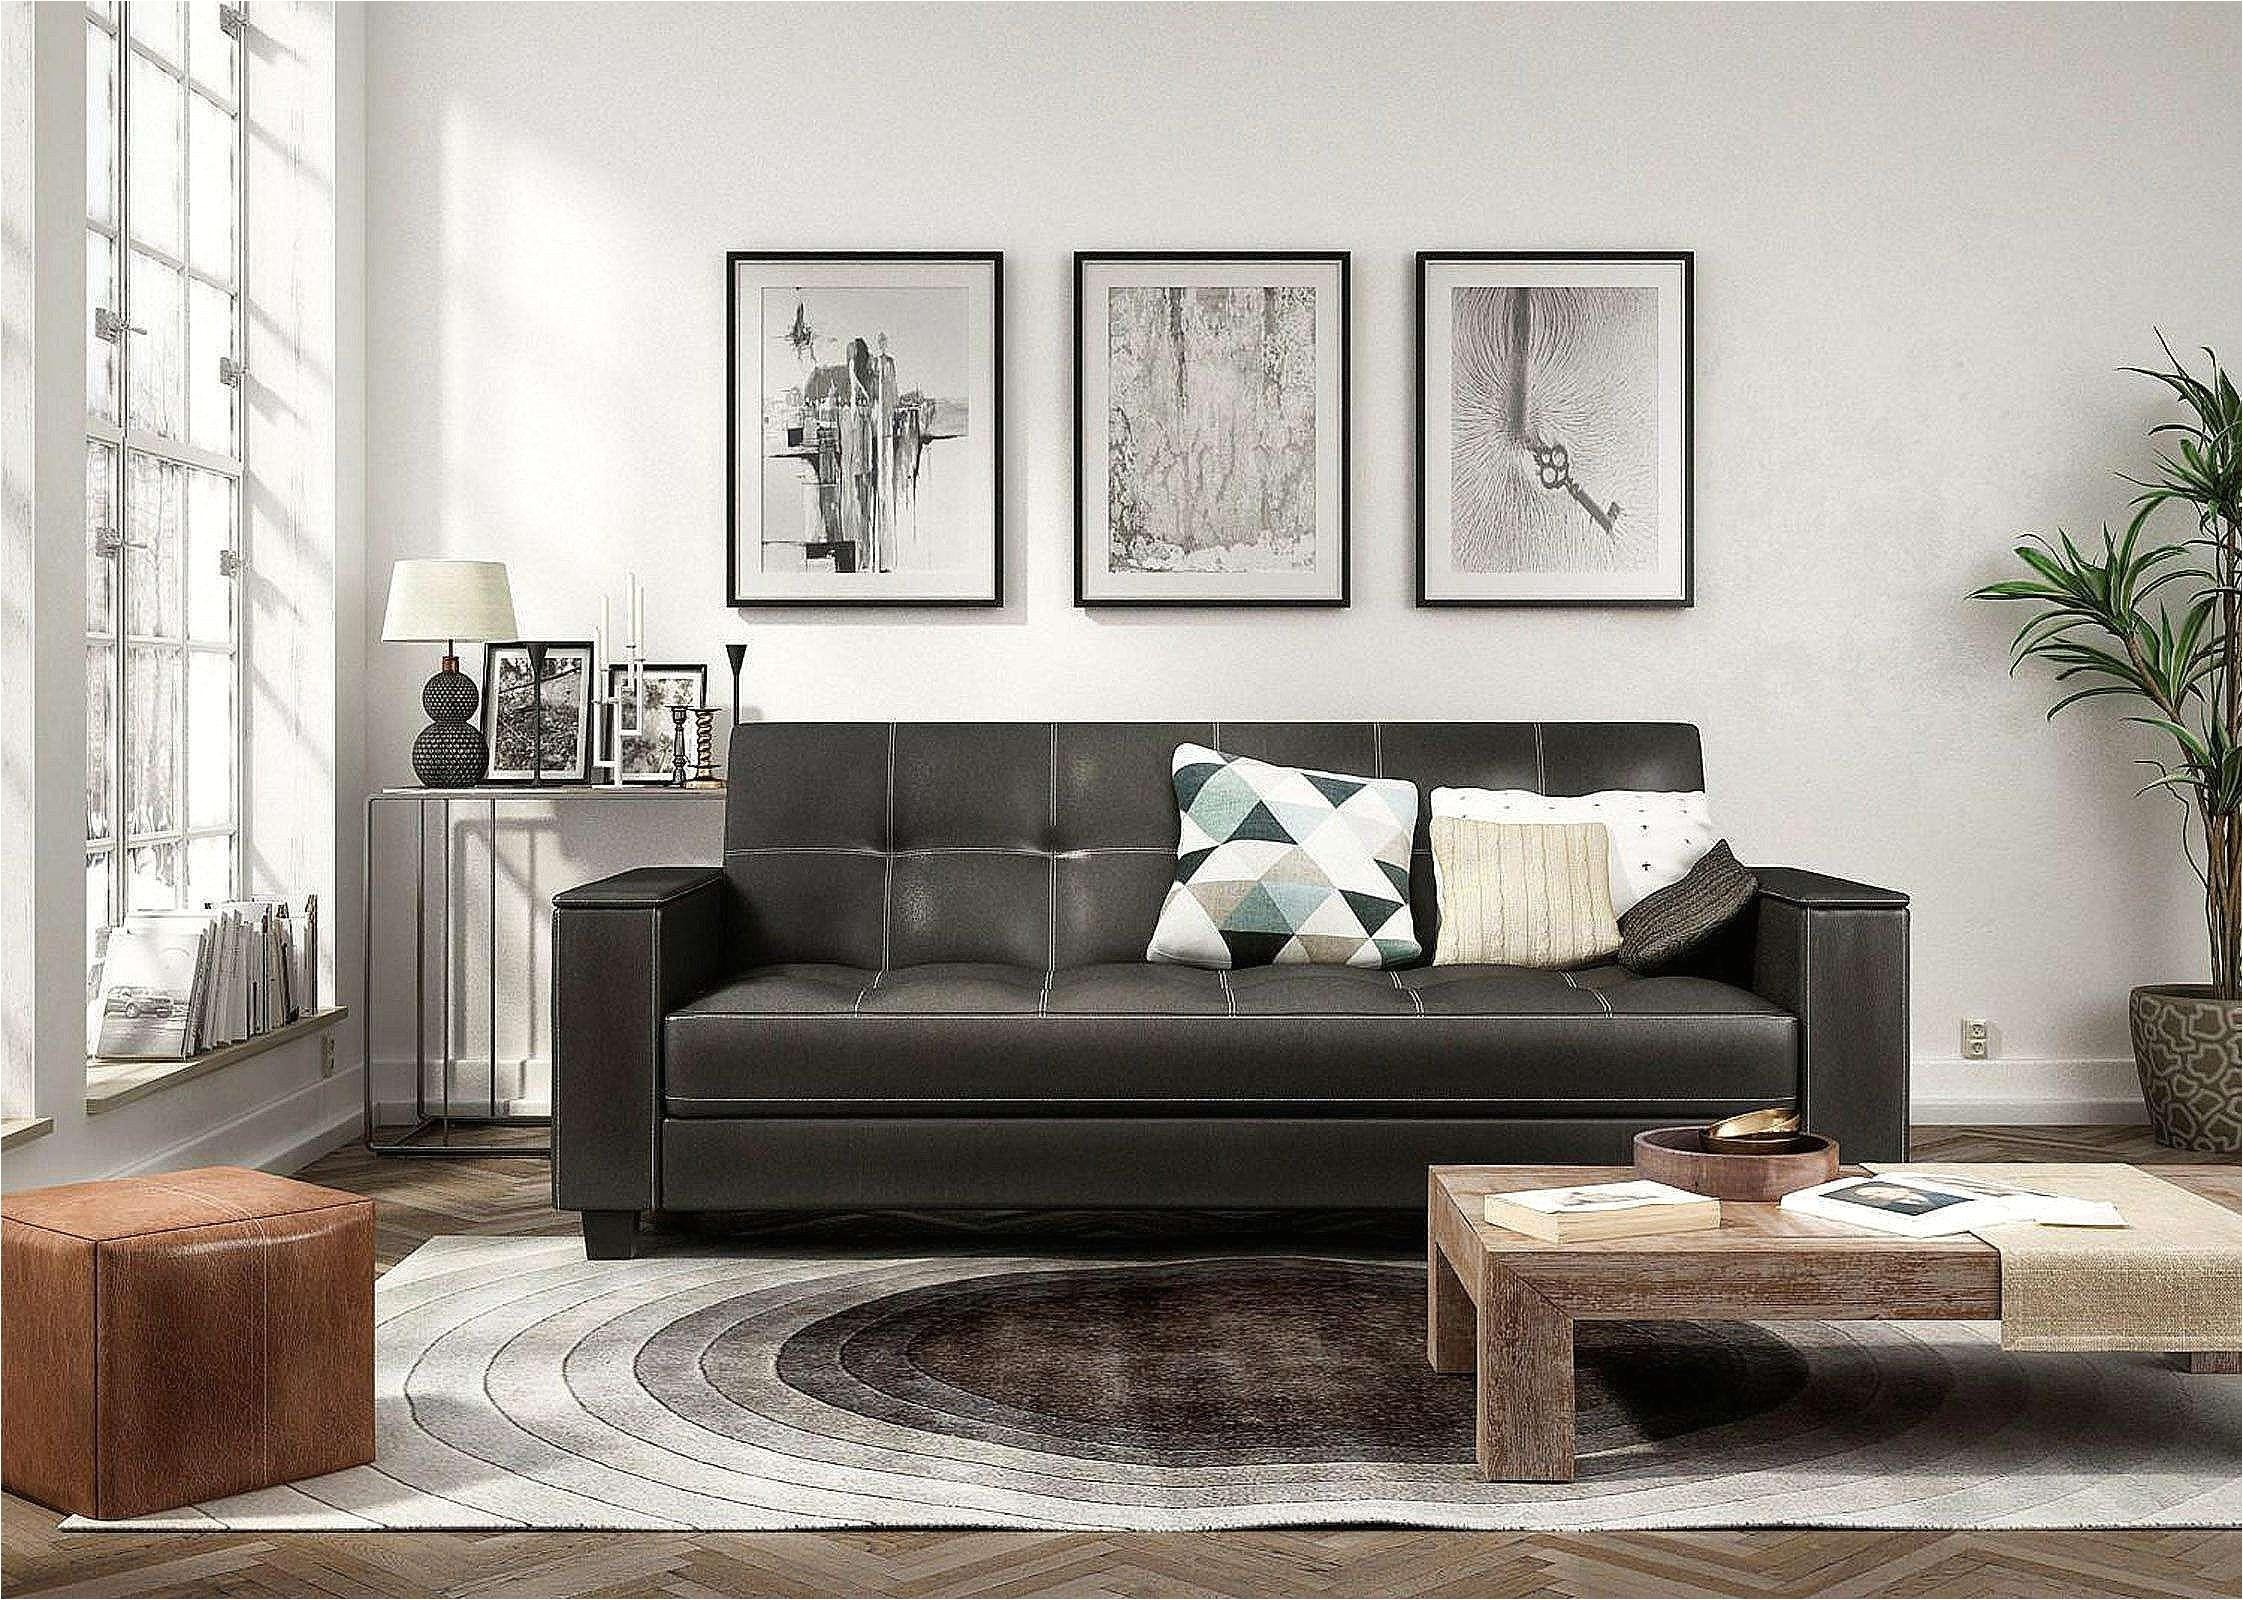 Laurels Furniture Modern Living Room Wall Decor Elegant Modern Living Room Furniture